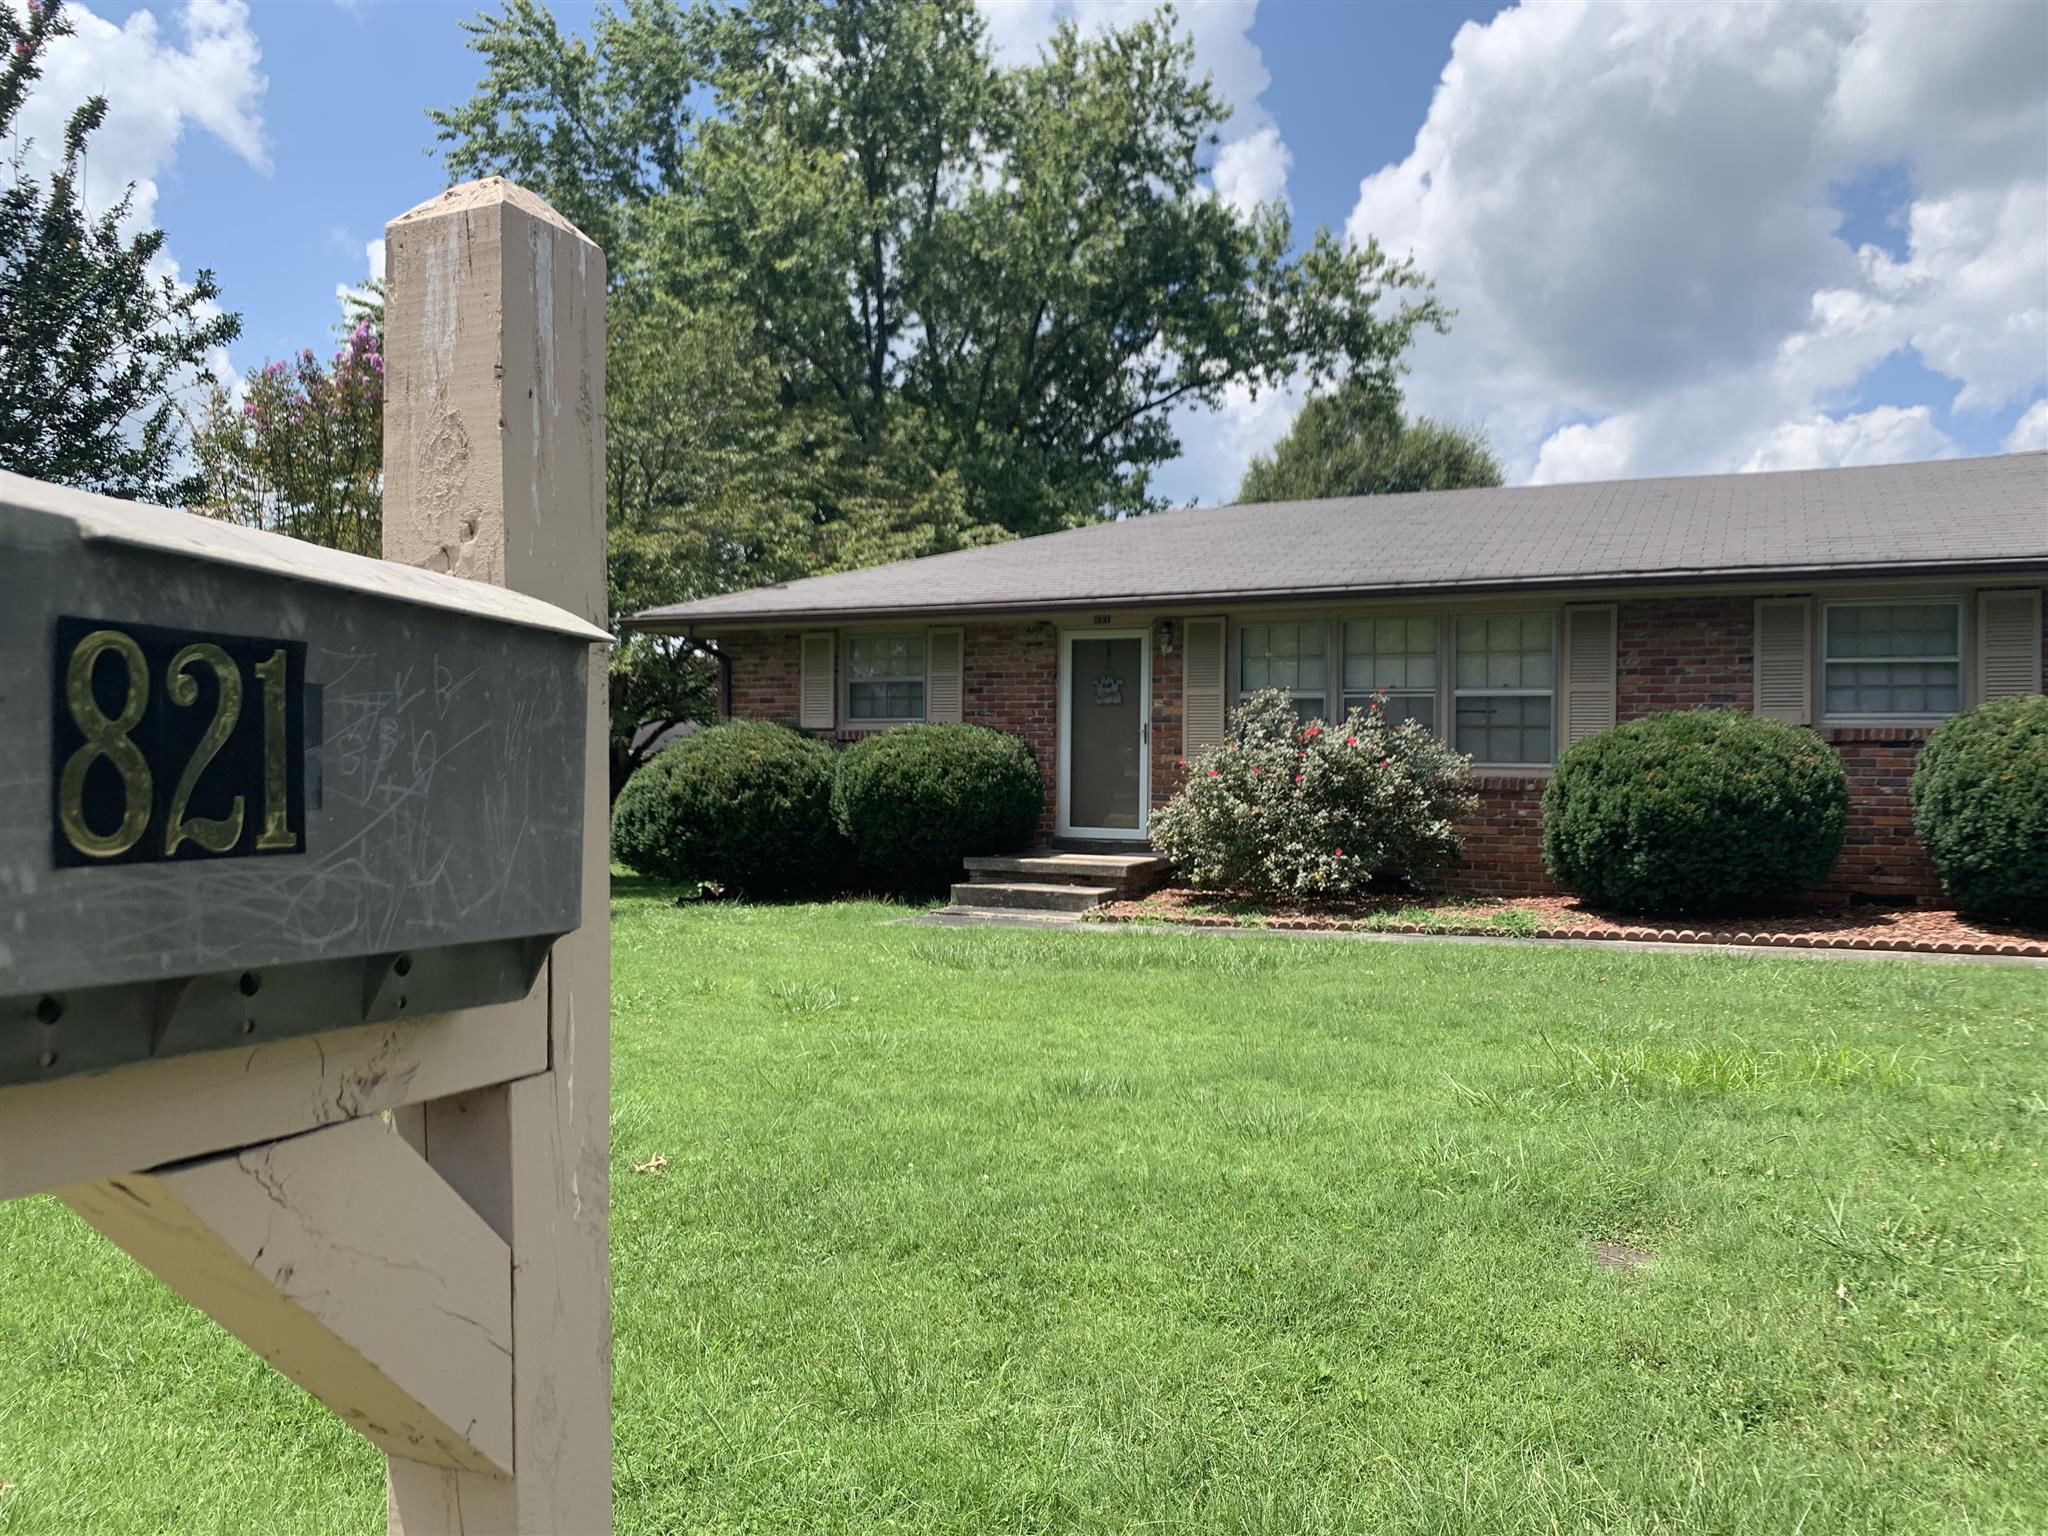 821 Fairlane Cir, Smithville, TN 37166 - Smithville, TN real estate listing